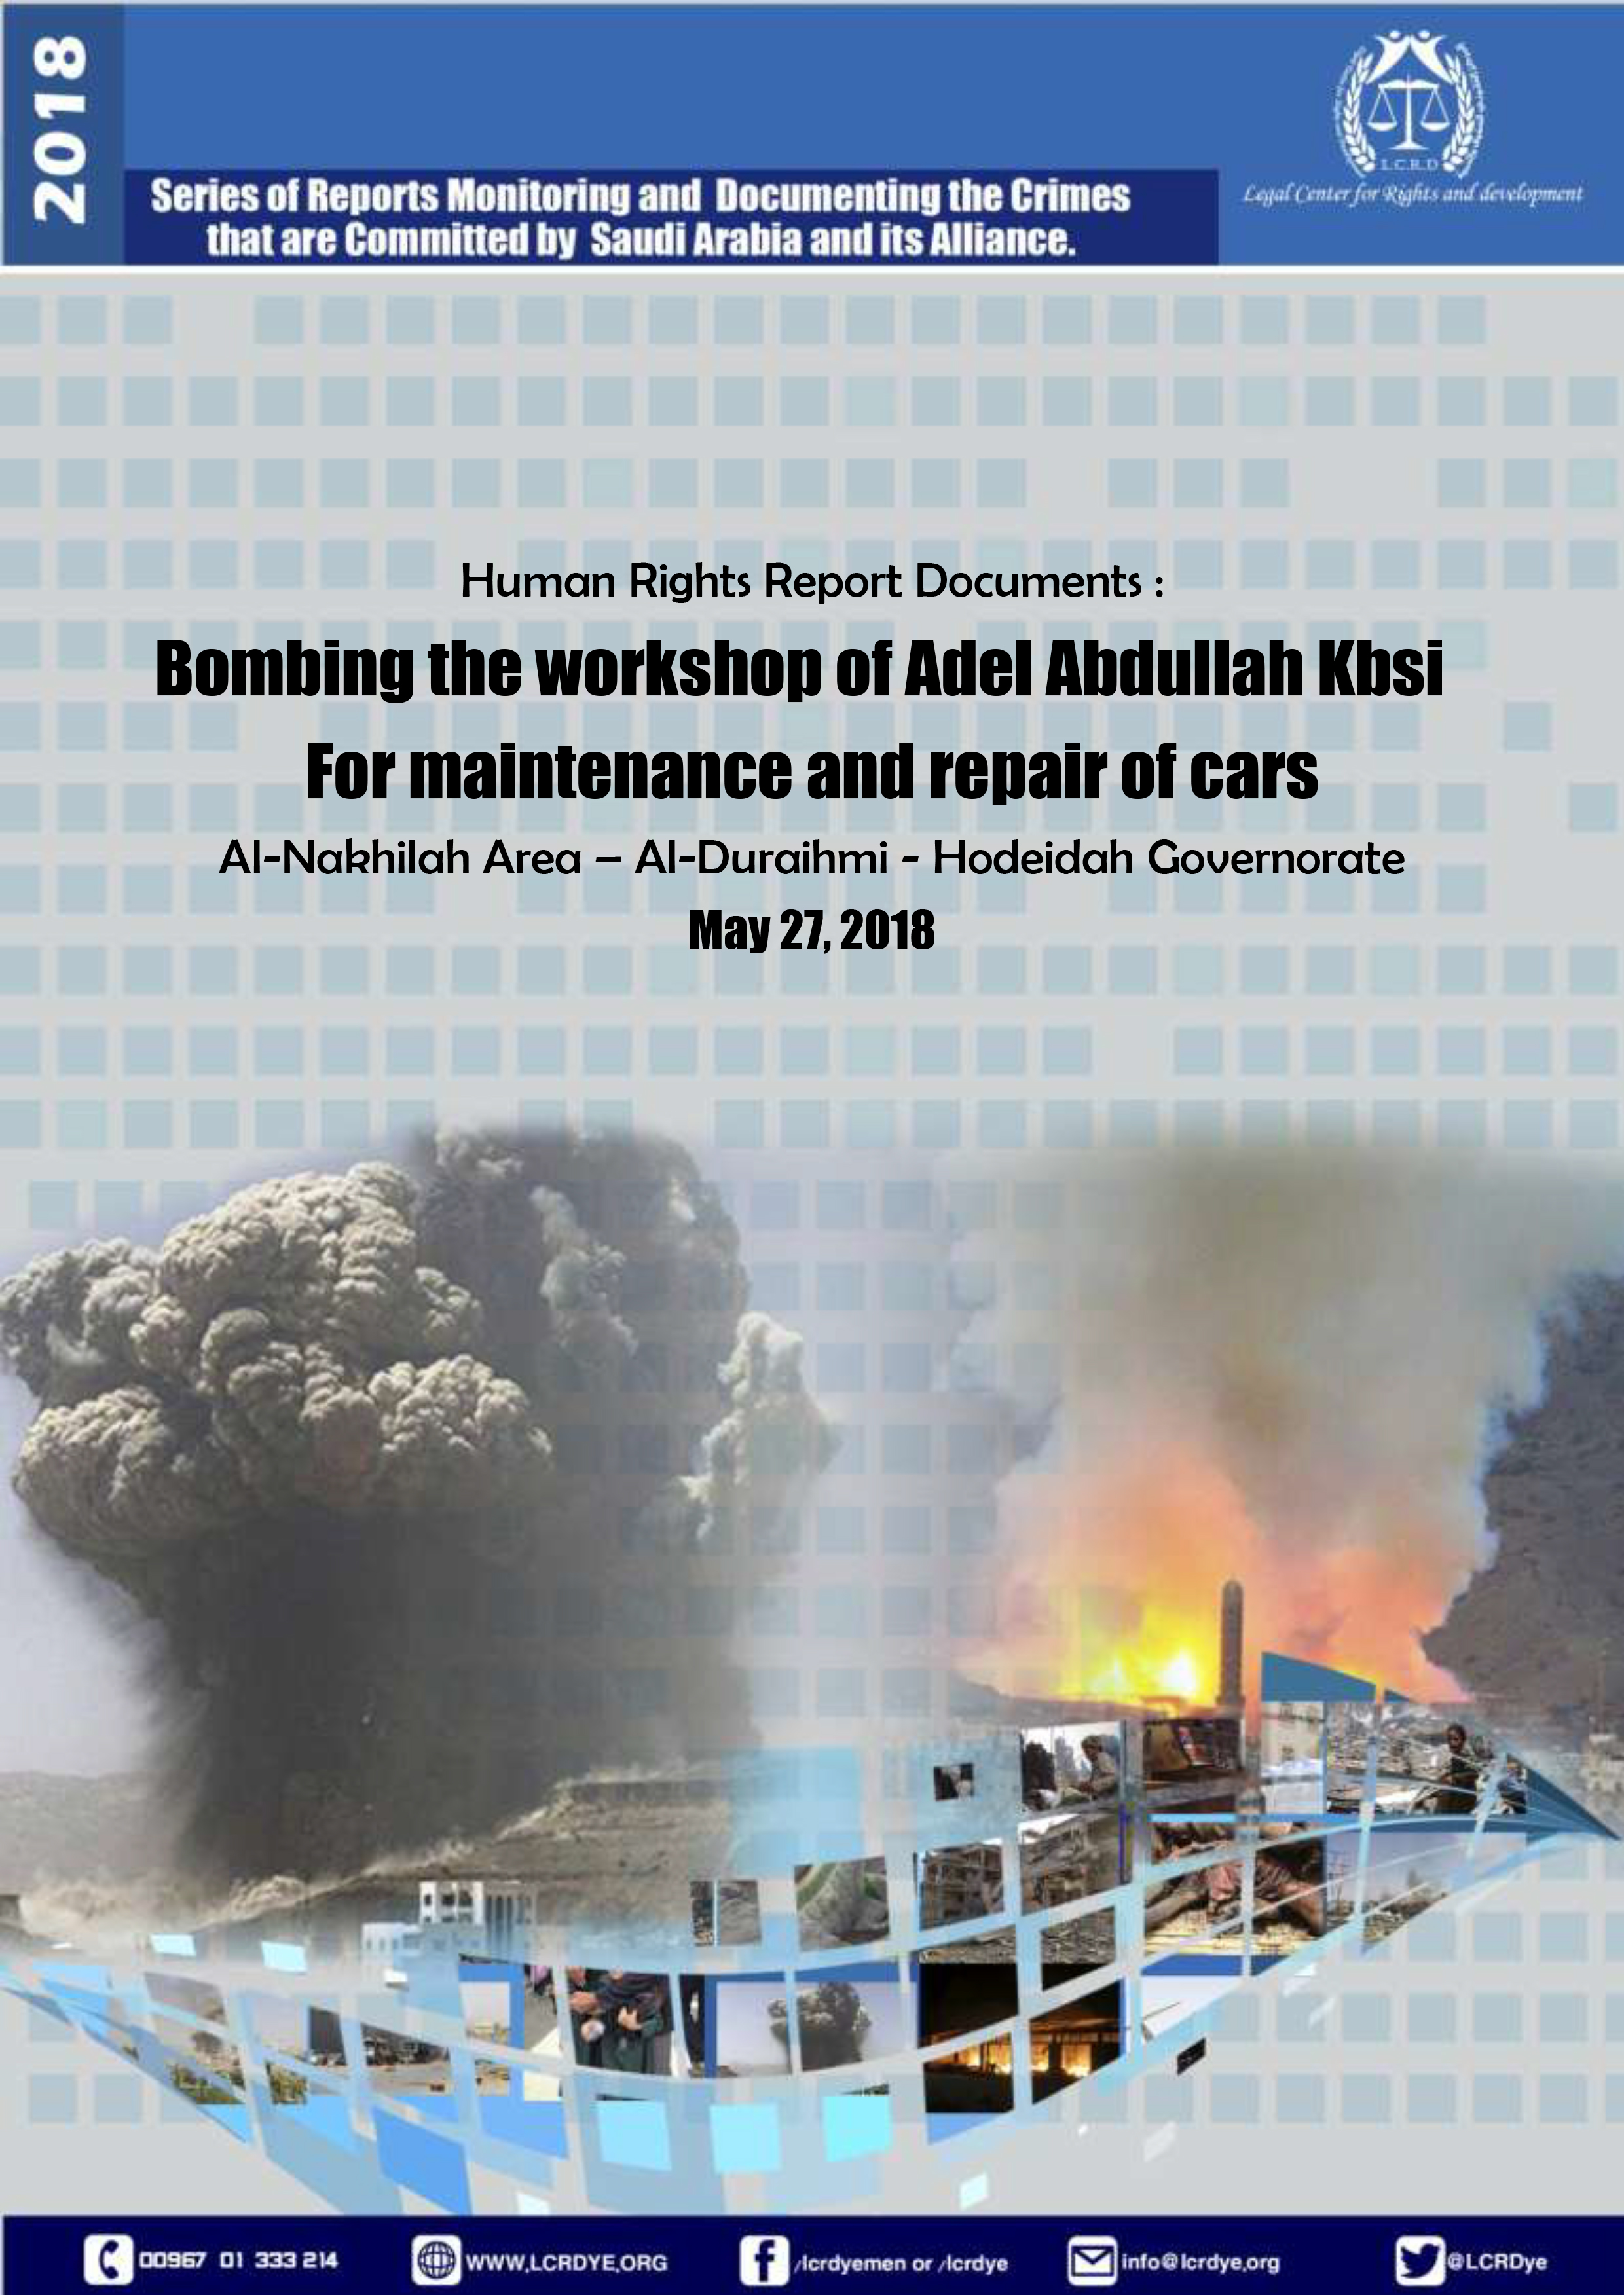 Bombing the workshop of Adel Al- Kbsi – Al-Duraihmi Hodeidah 27052018-1 copy